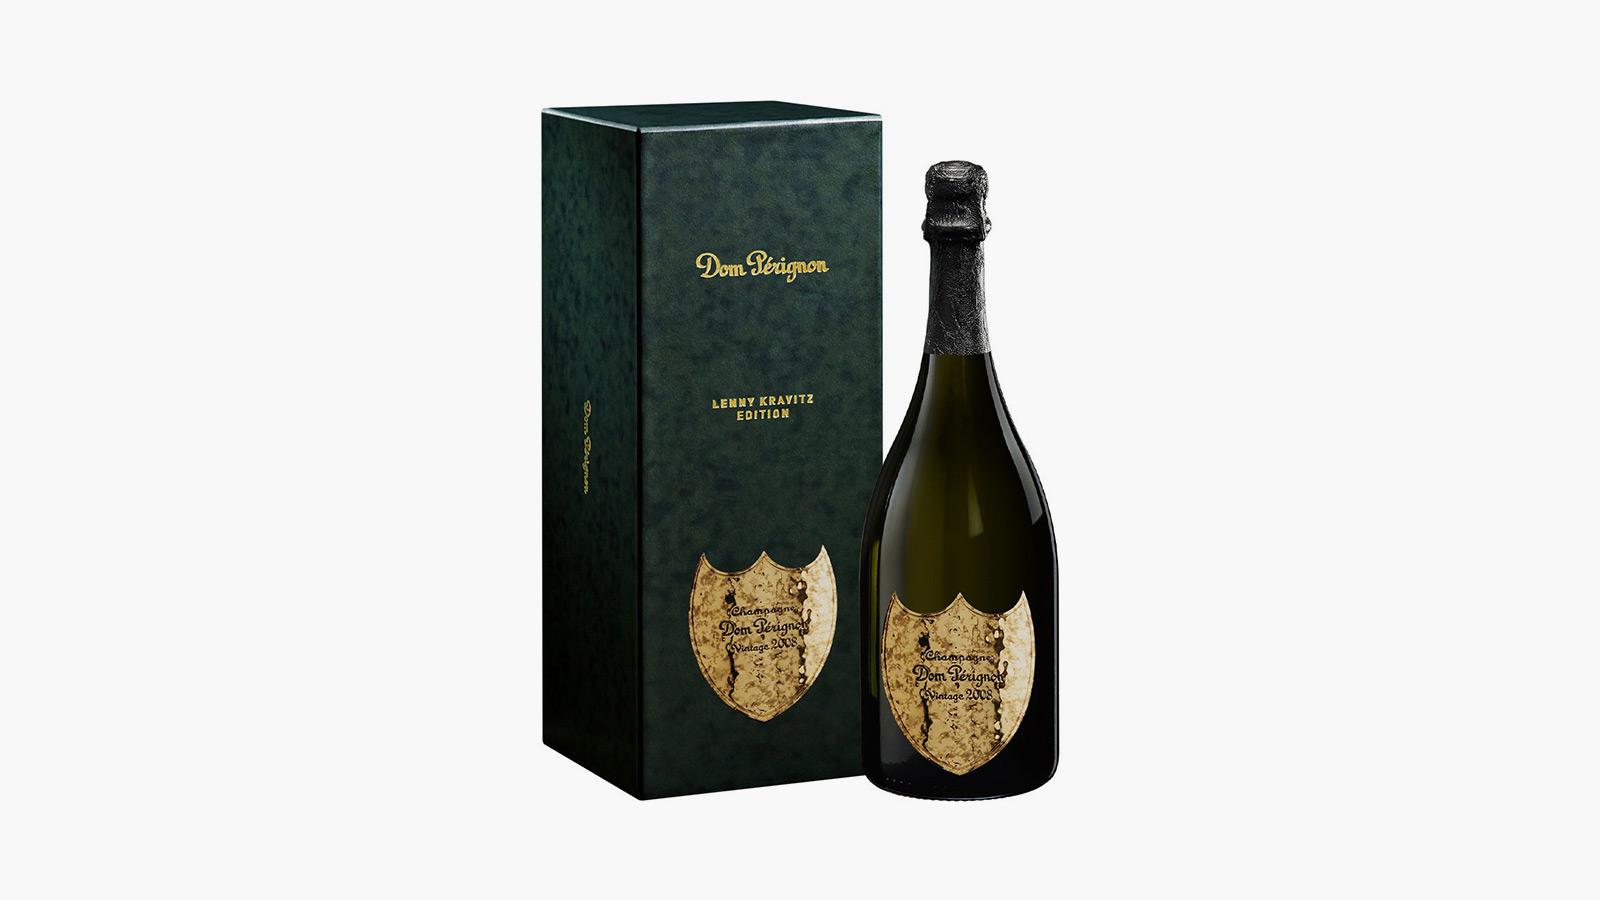 Dom Pérignon Vintage 2008 Lenny Kravitz Edition